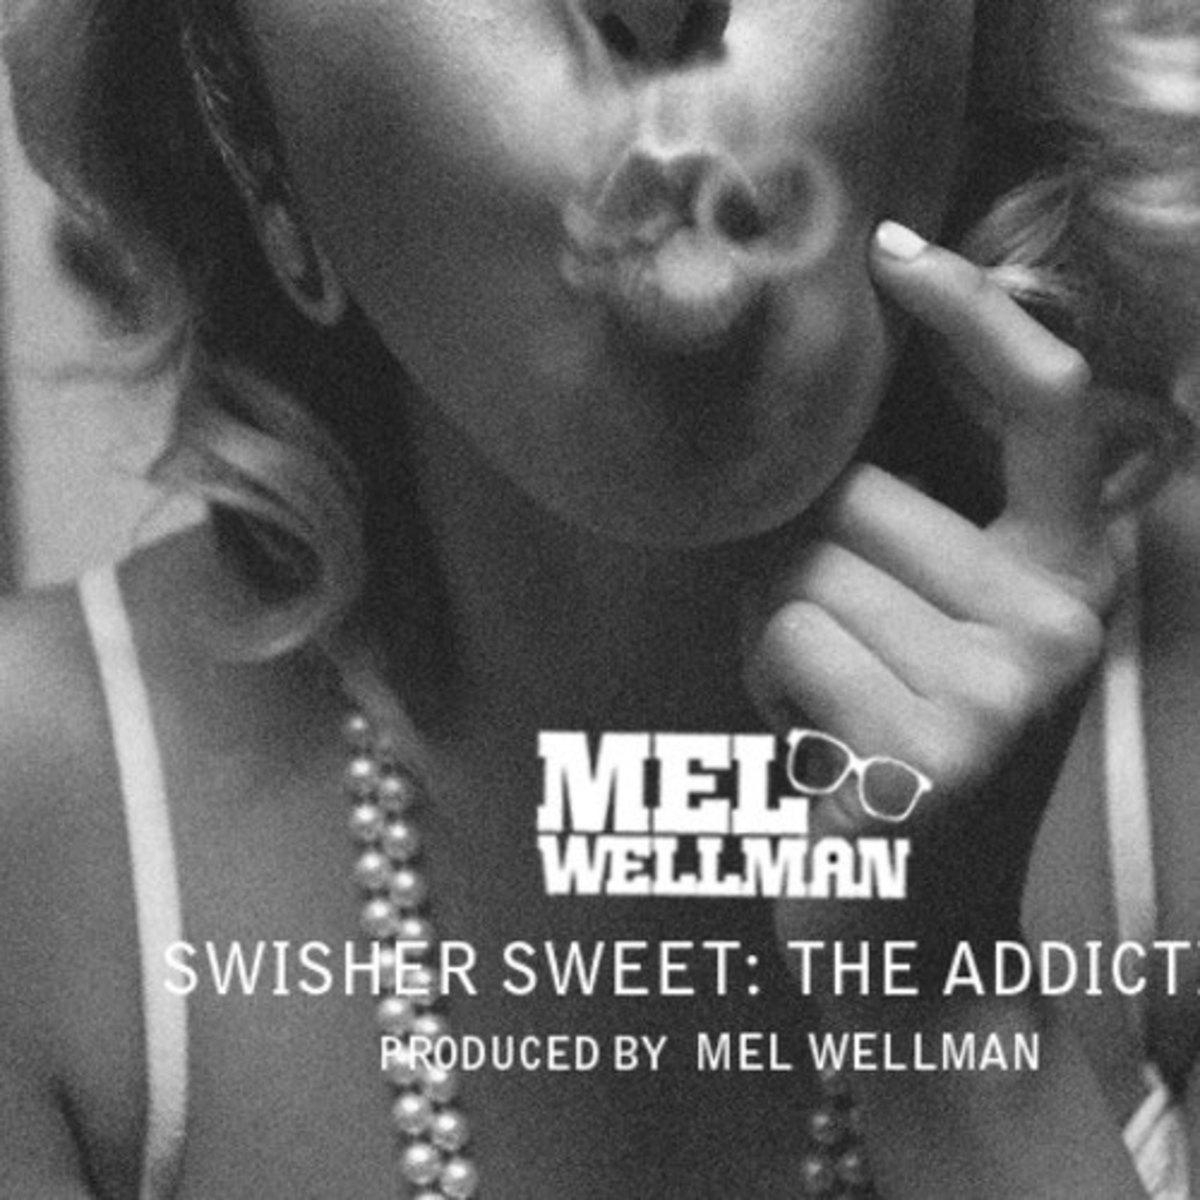 melwellman-swisher.jpg